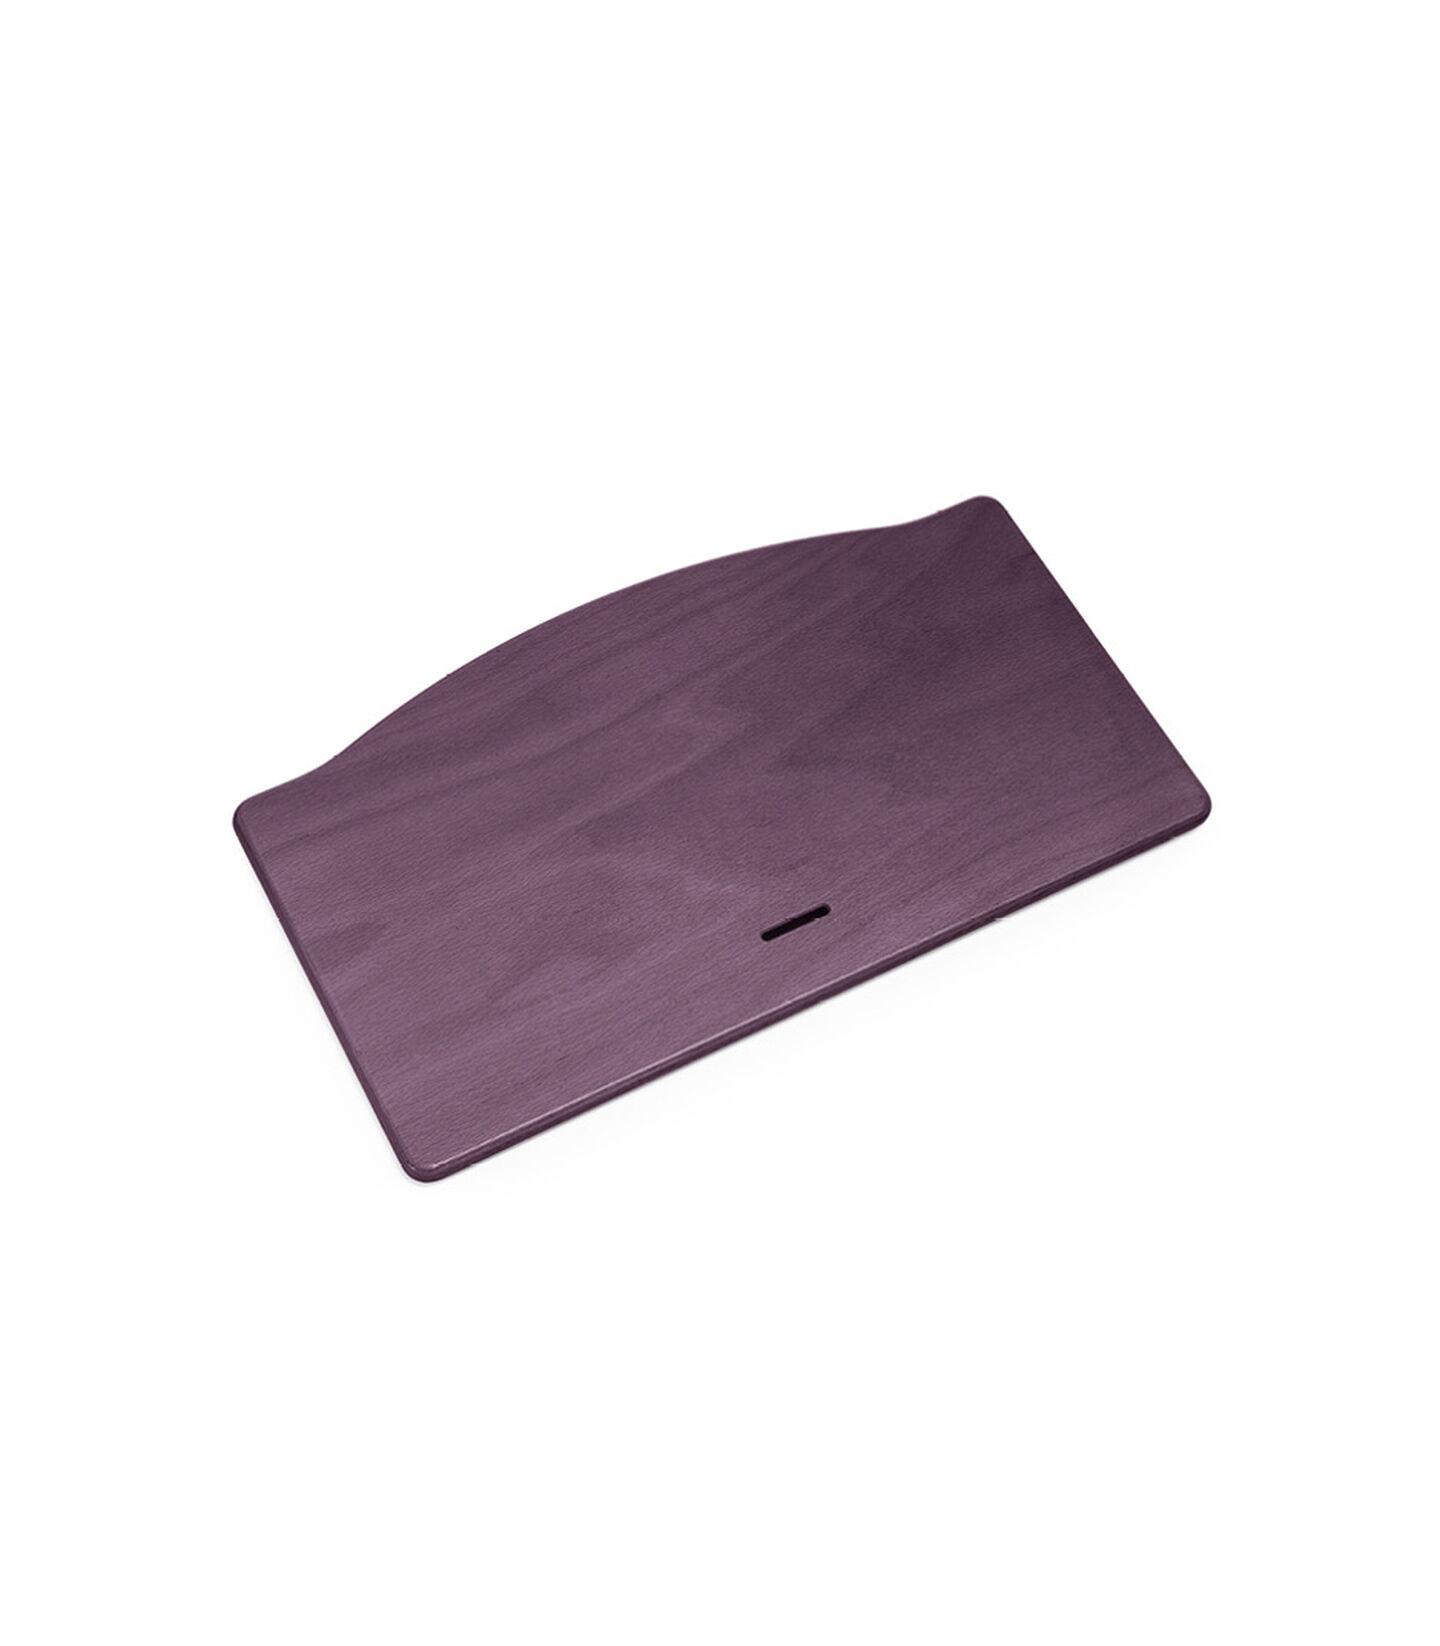 Tripp Trapp® Seatplate Plum Purple, Ciruela, mainview view 2